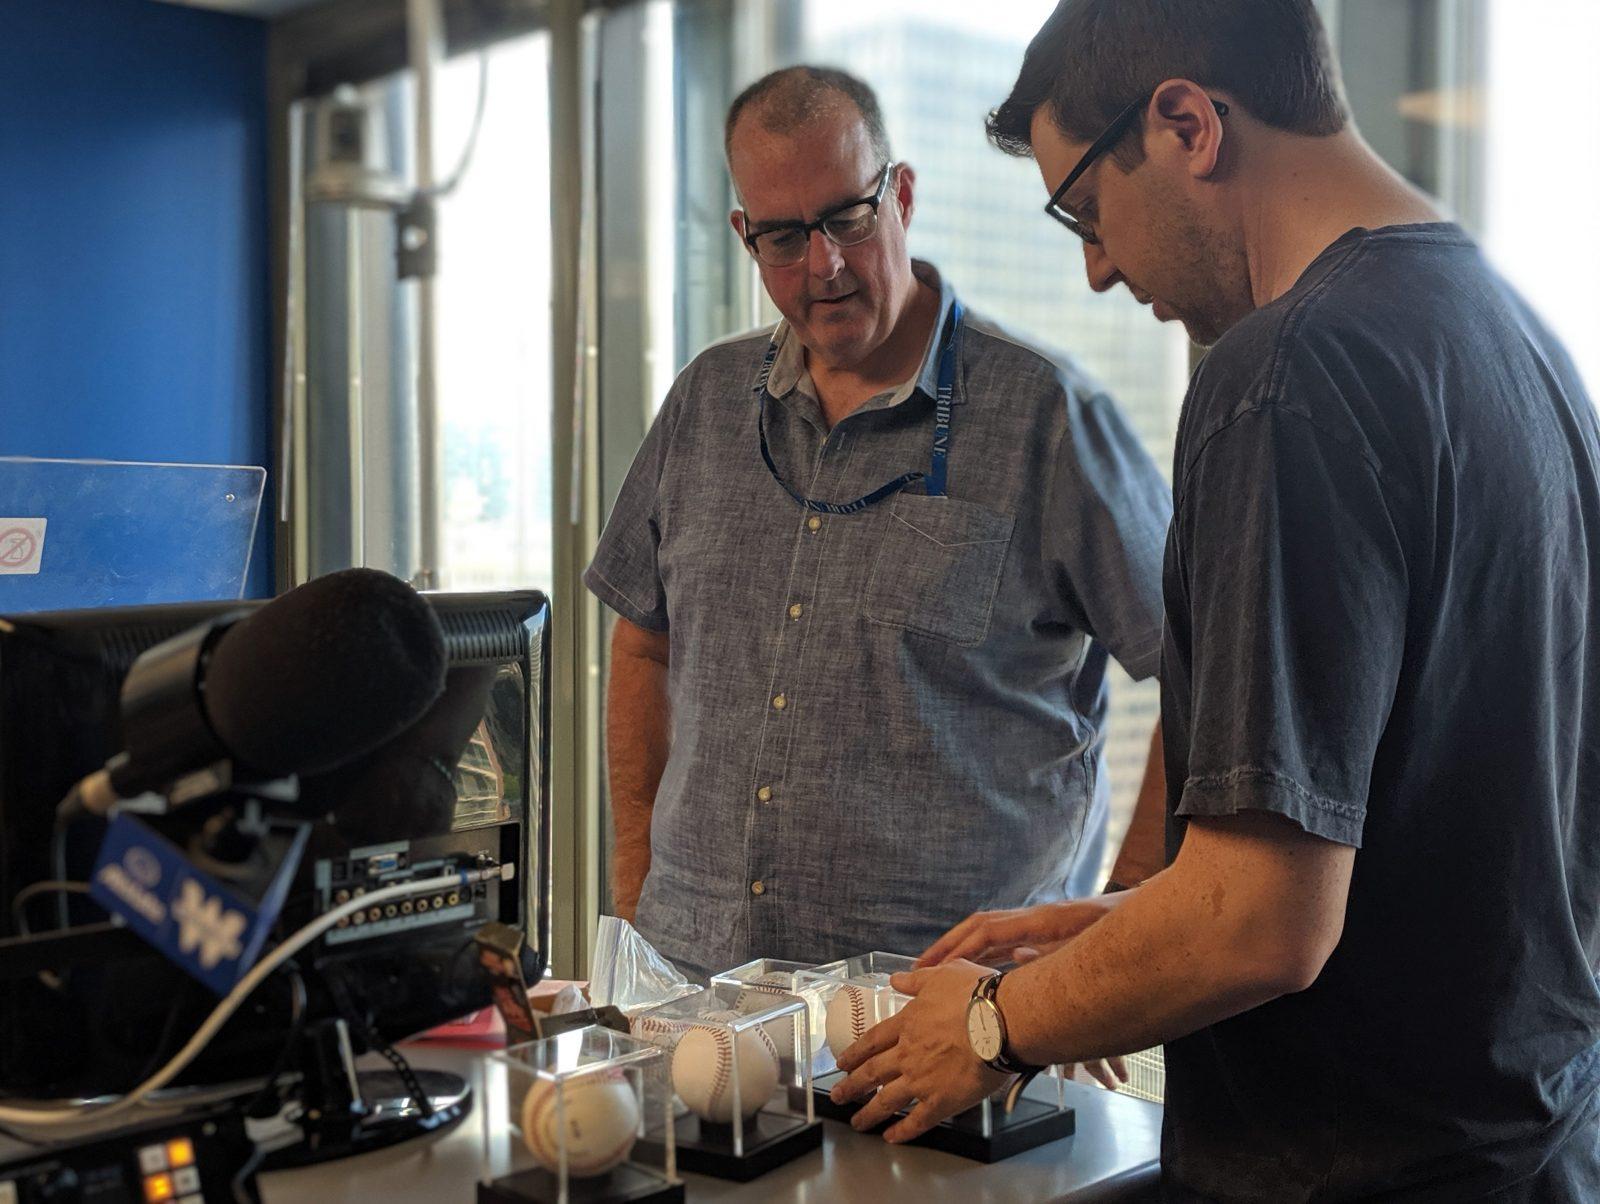 Appraiser Michael Osacky, right, examines sports memorabilia in-studio with Brian Noonan, left